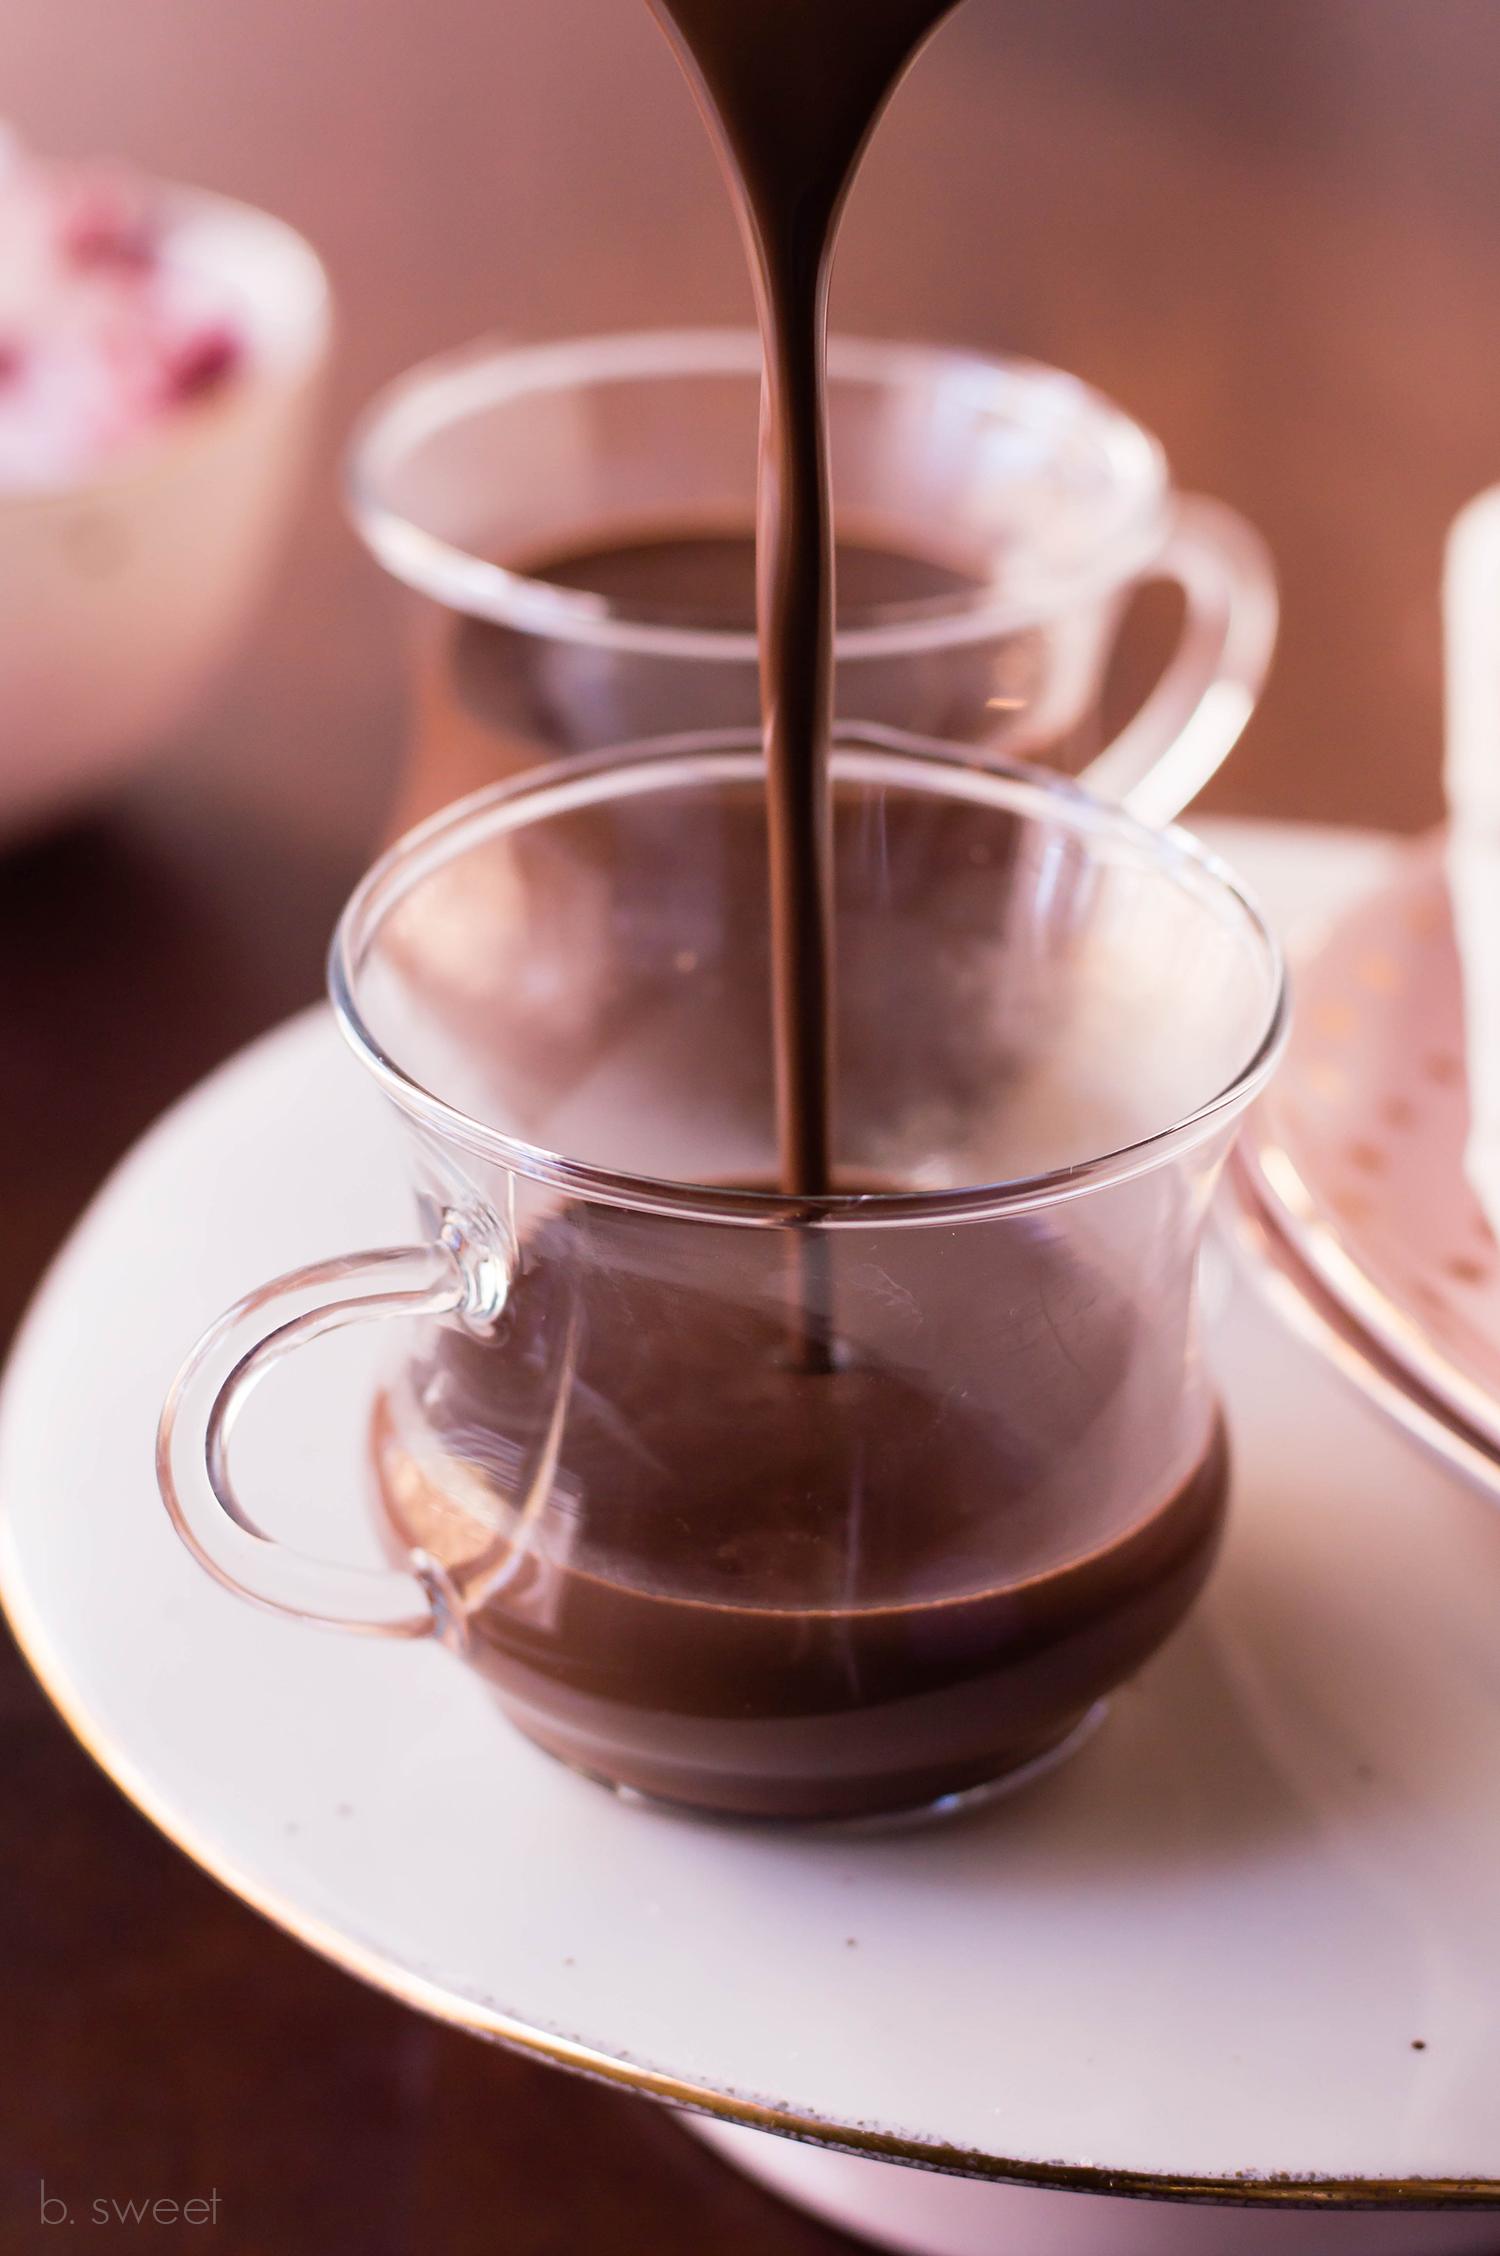 Dark Chocolate Raspberry Hot Chocolate for Two - b. sweet